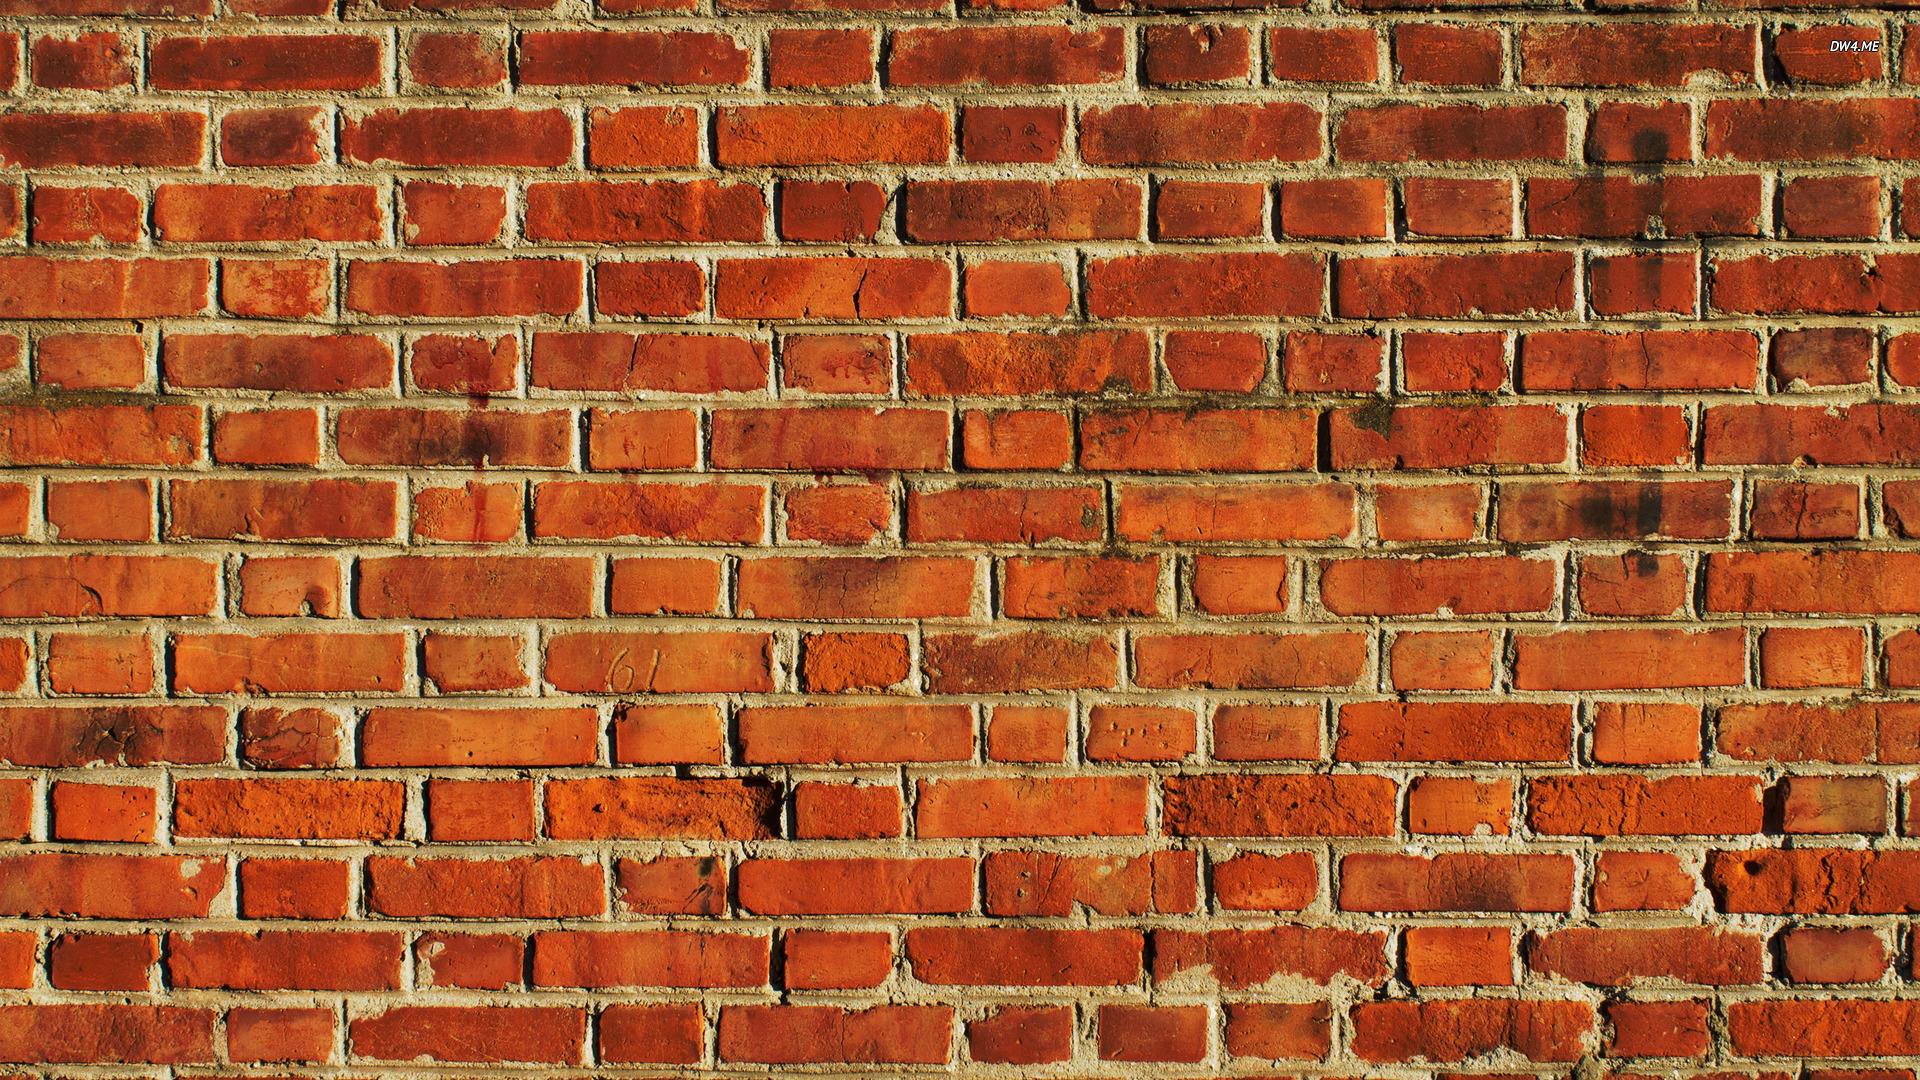 Brick Wall Wallpaper Photography Wallpapers 1920x1080